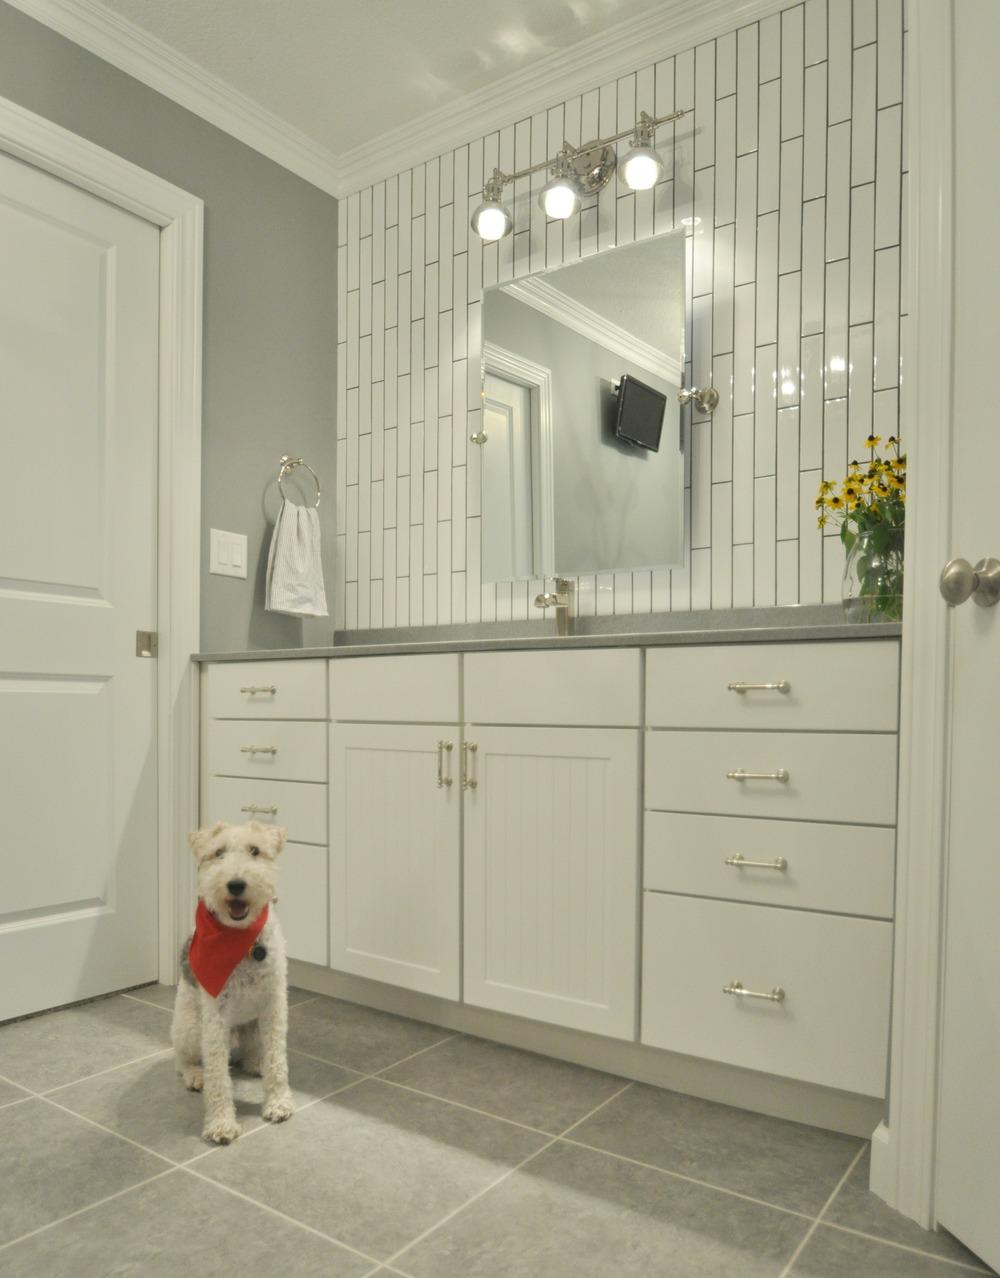 master bathroom reveal decor and the dog. Black Bedroom Furniture Sets. Home Design Ideas